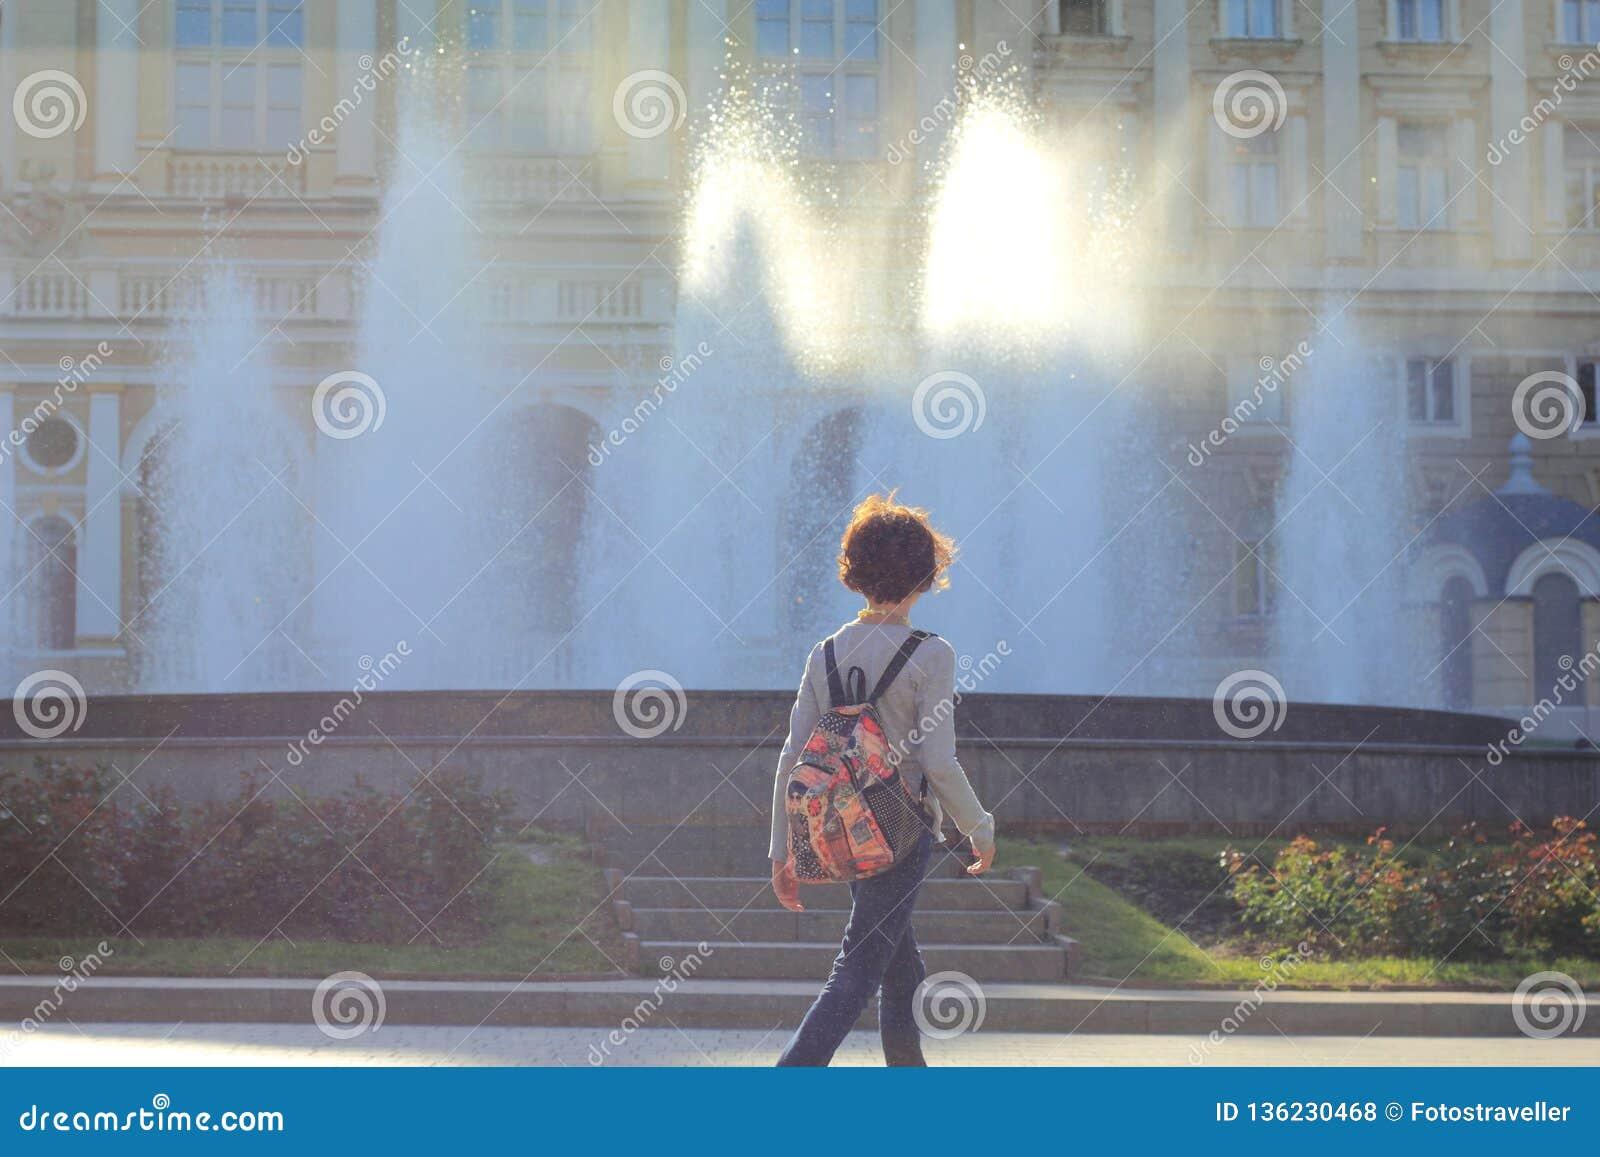 Sunlight coming through fountain water streams